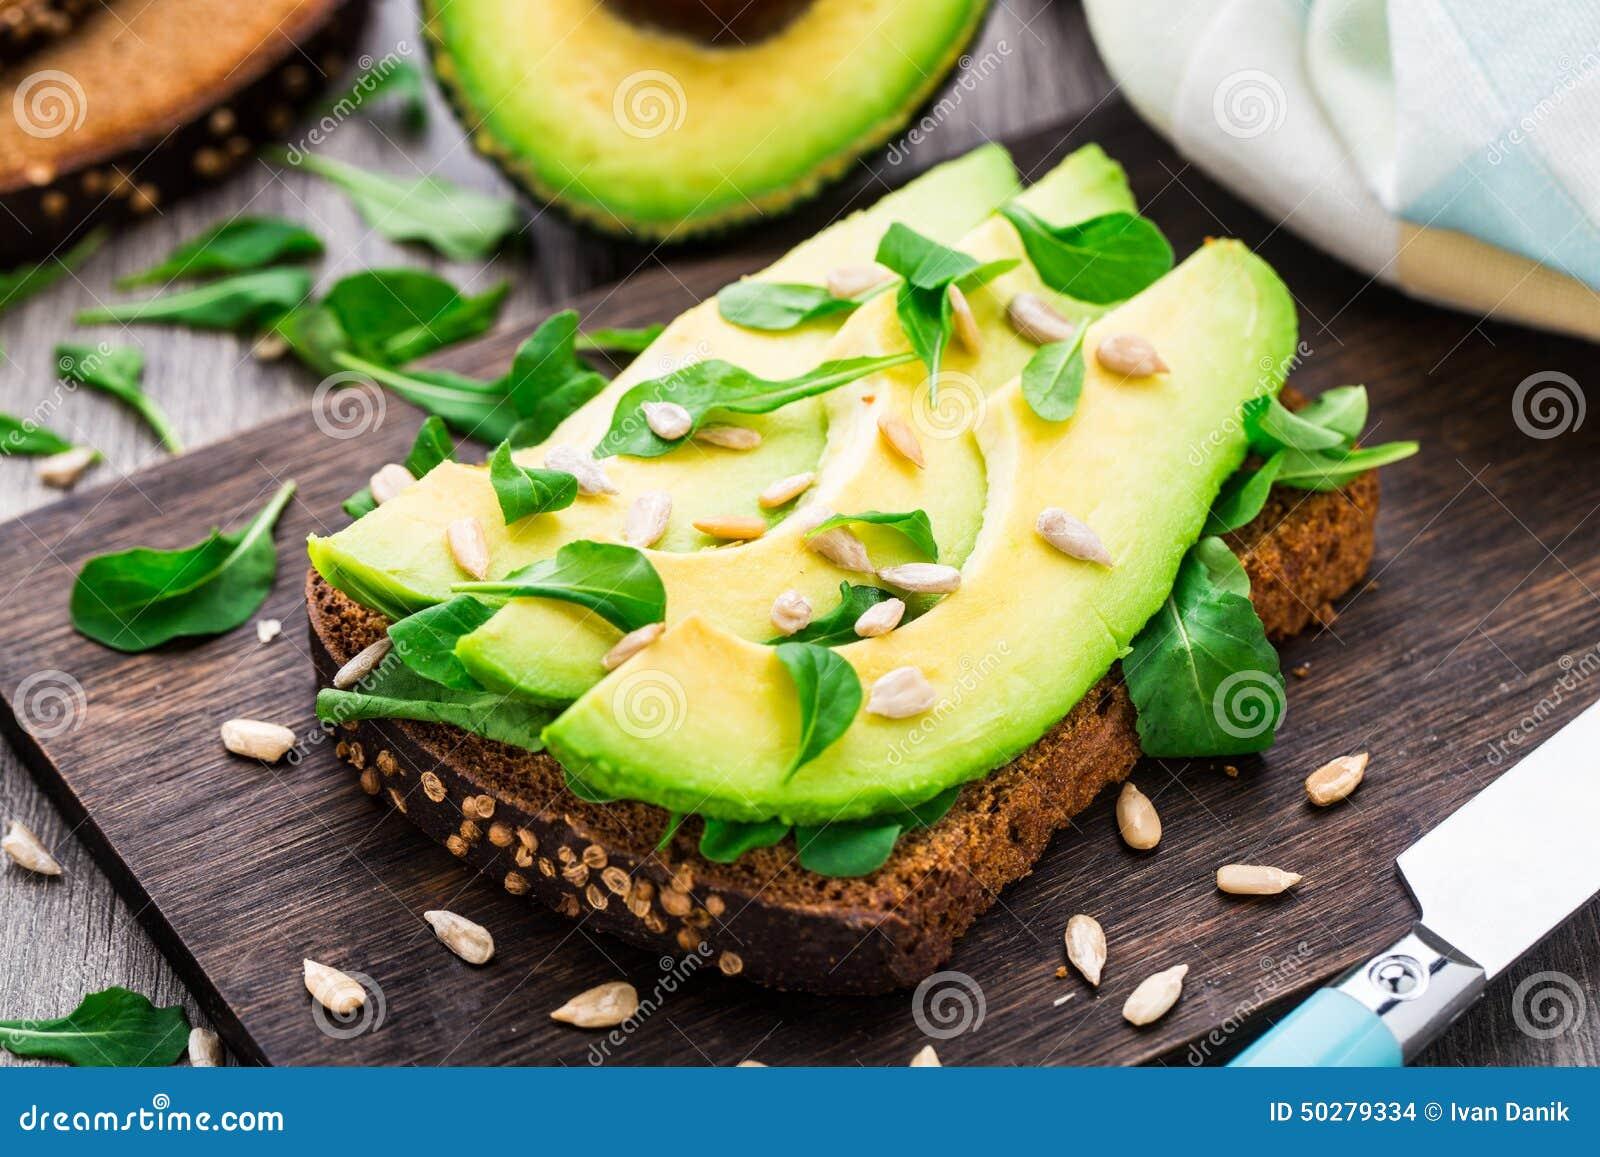 Avocado Sandwich Stock Photo - Image: 50279334